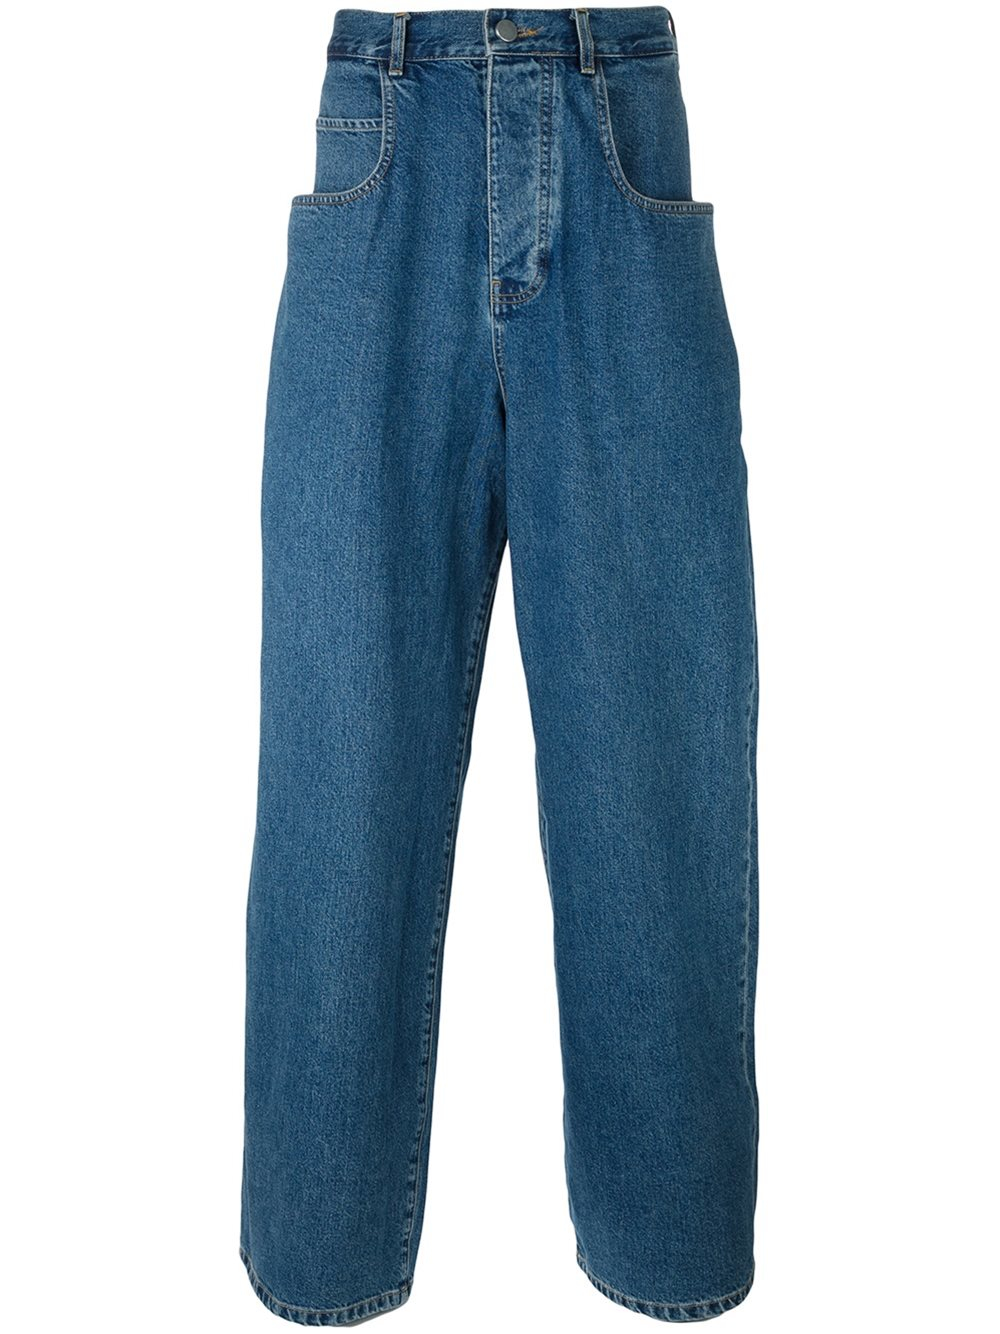 Martine rose Jean Wide Leg Jeans in Blue for Men